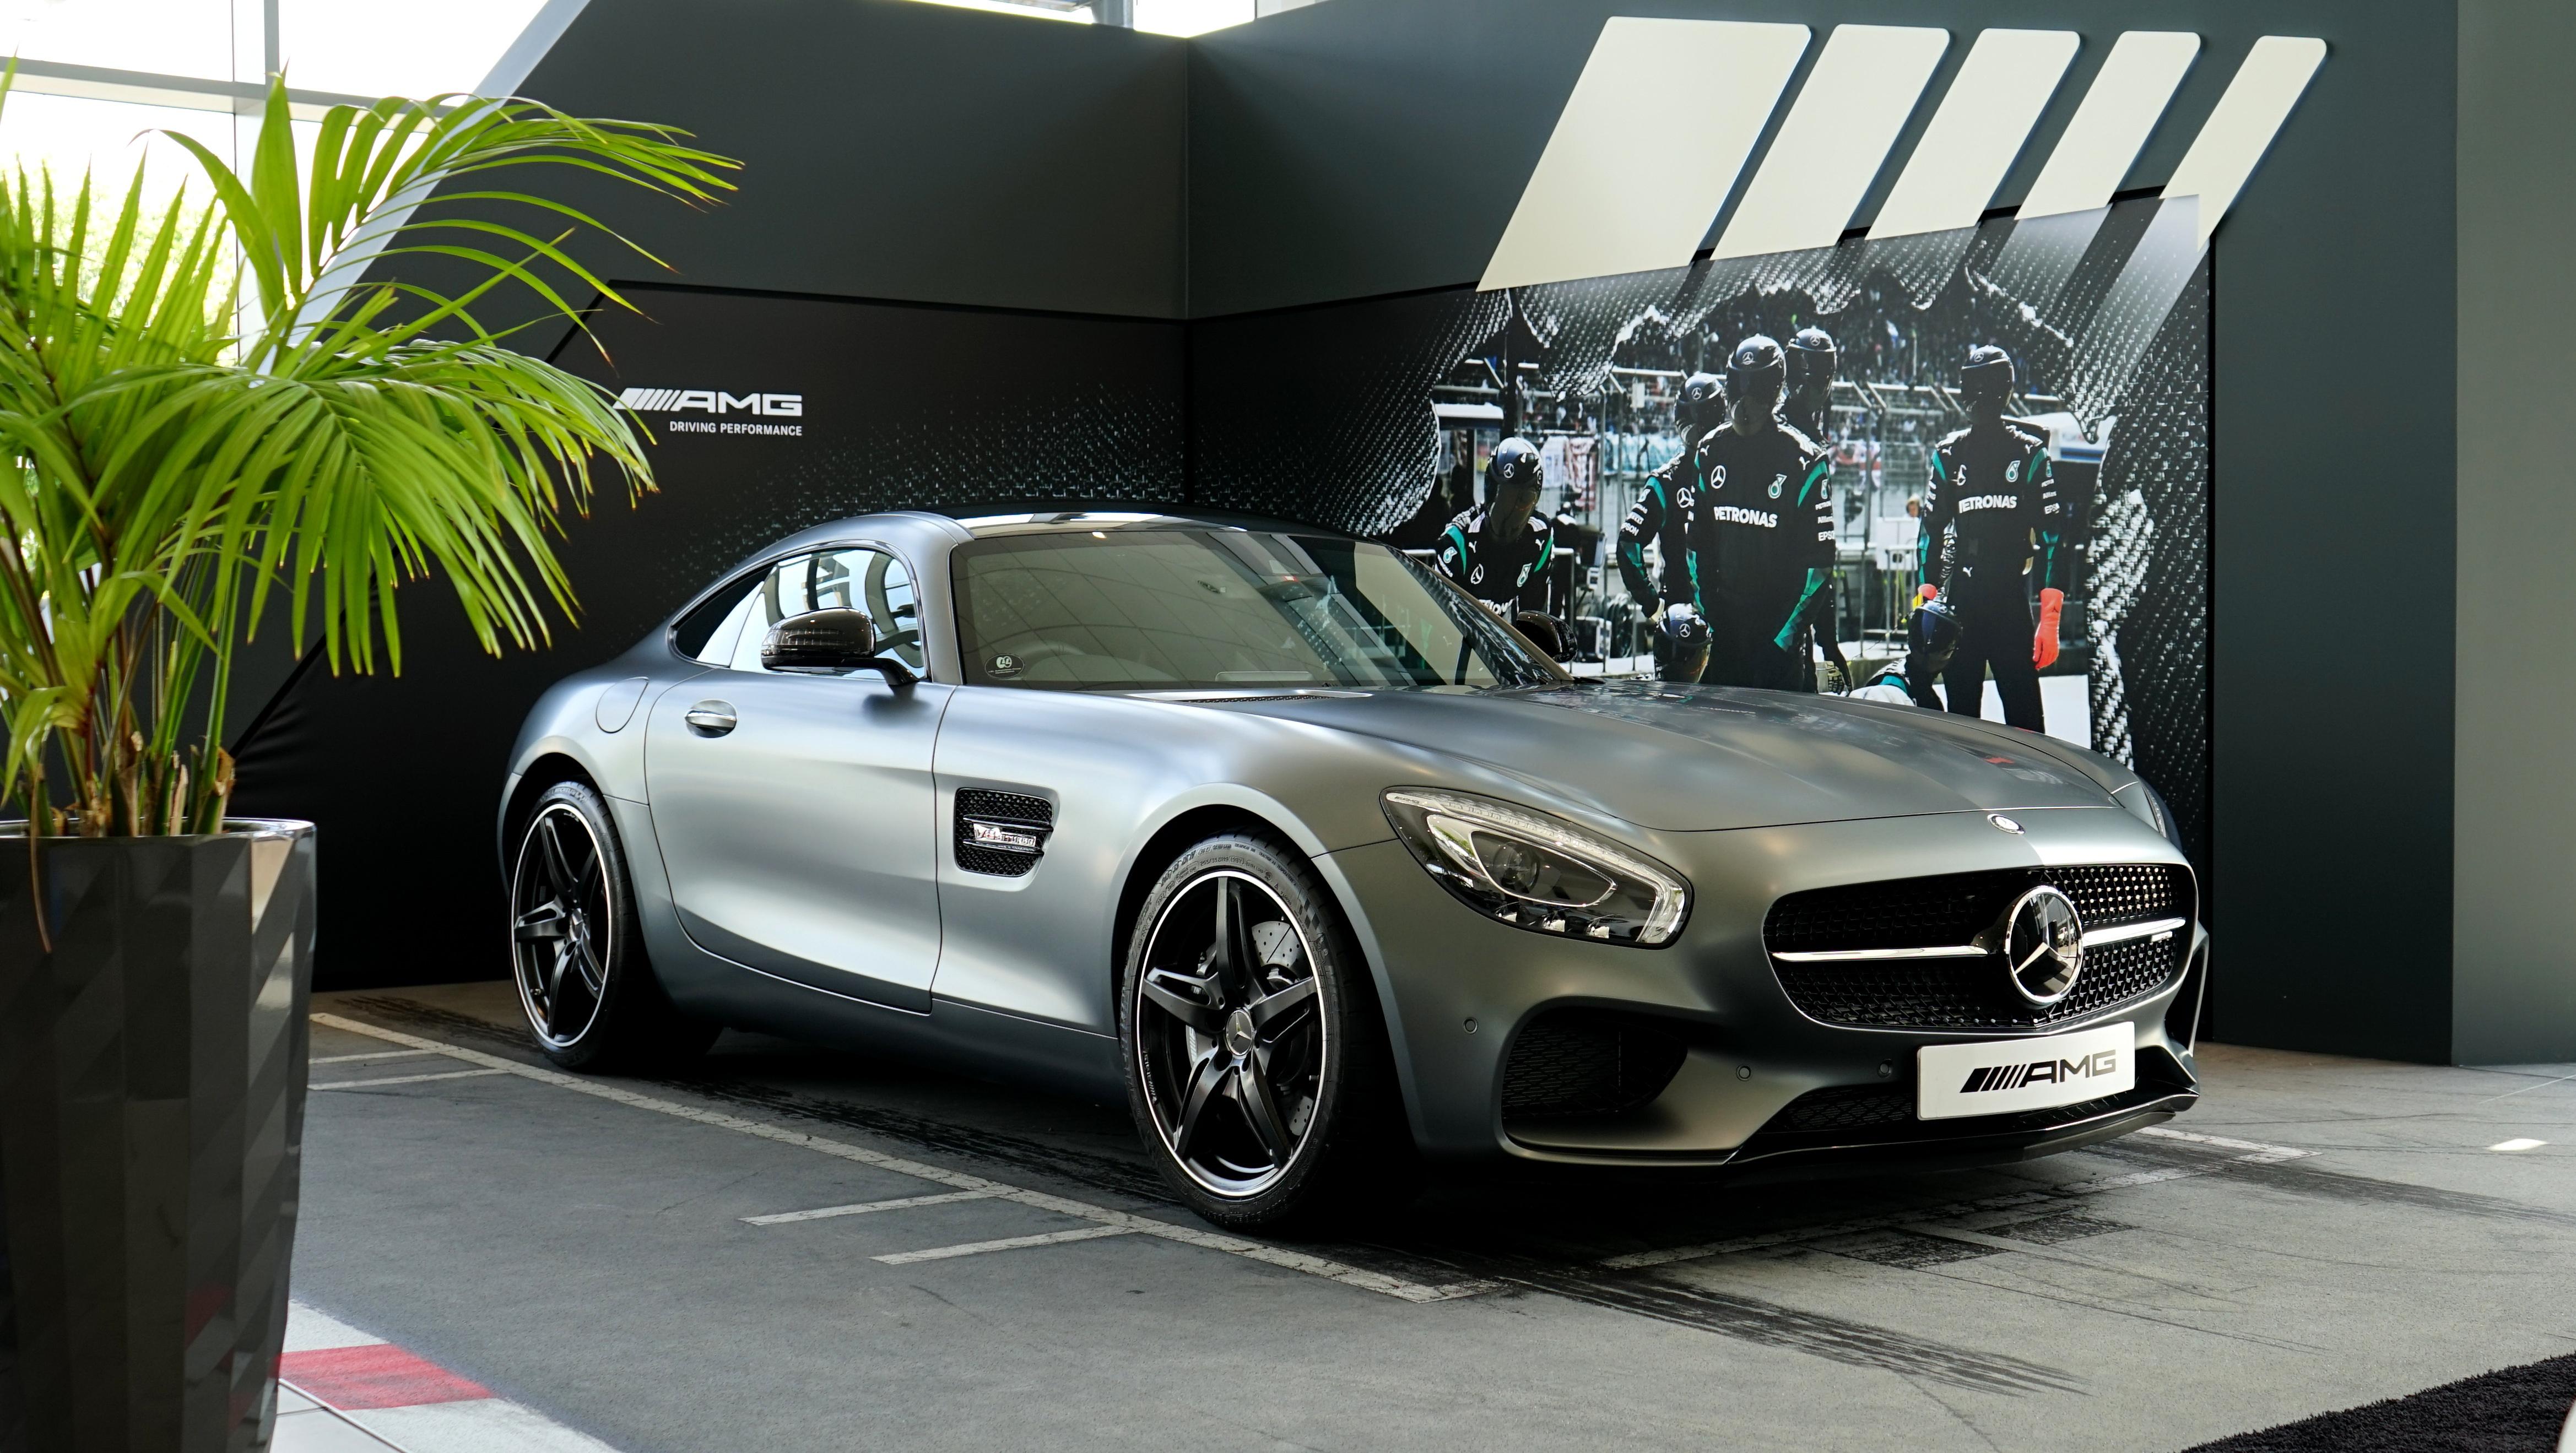 Mercedes benz amg in the showroom 4k ultra hd wallpaper for Showroom mercedes benz